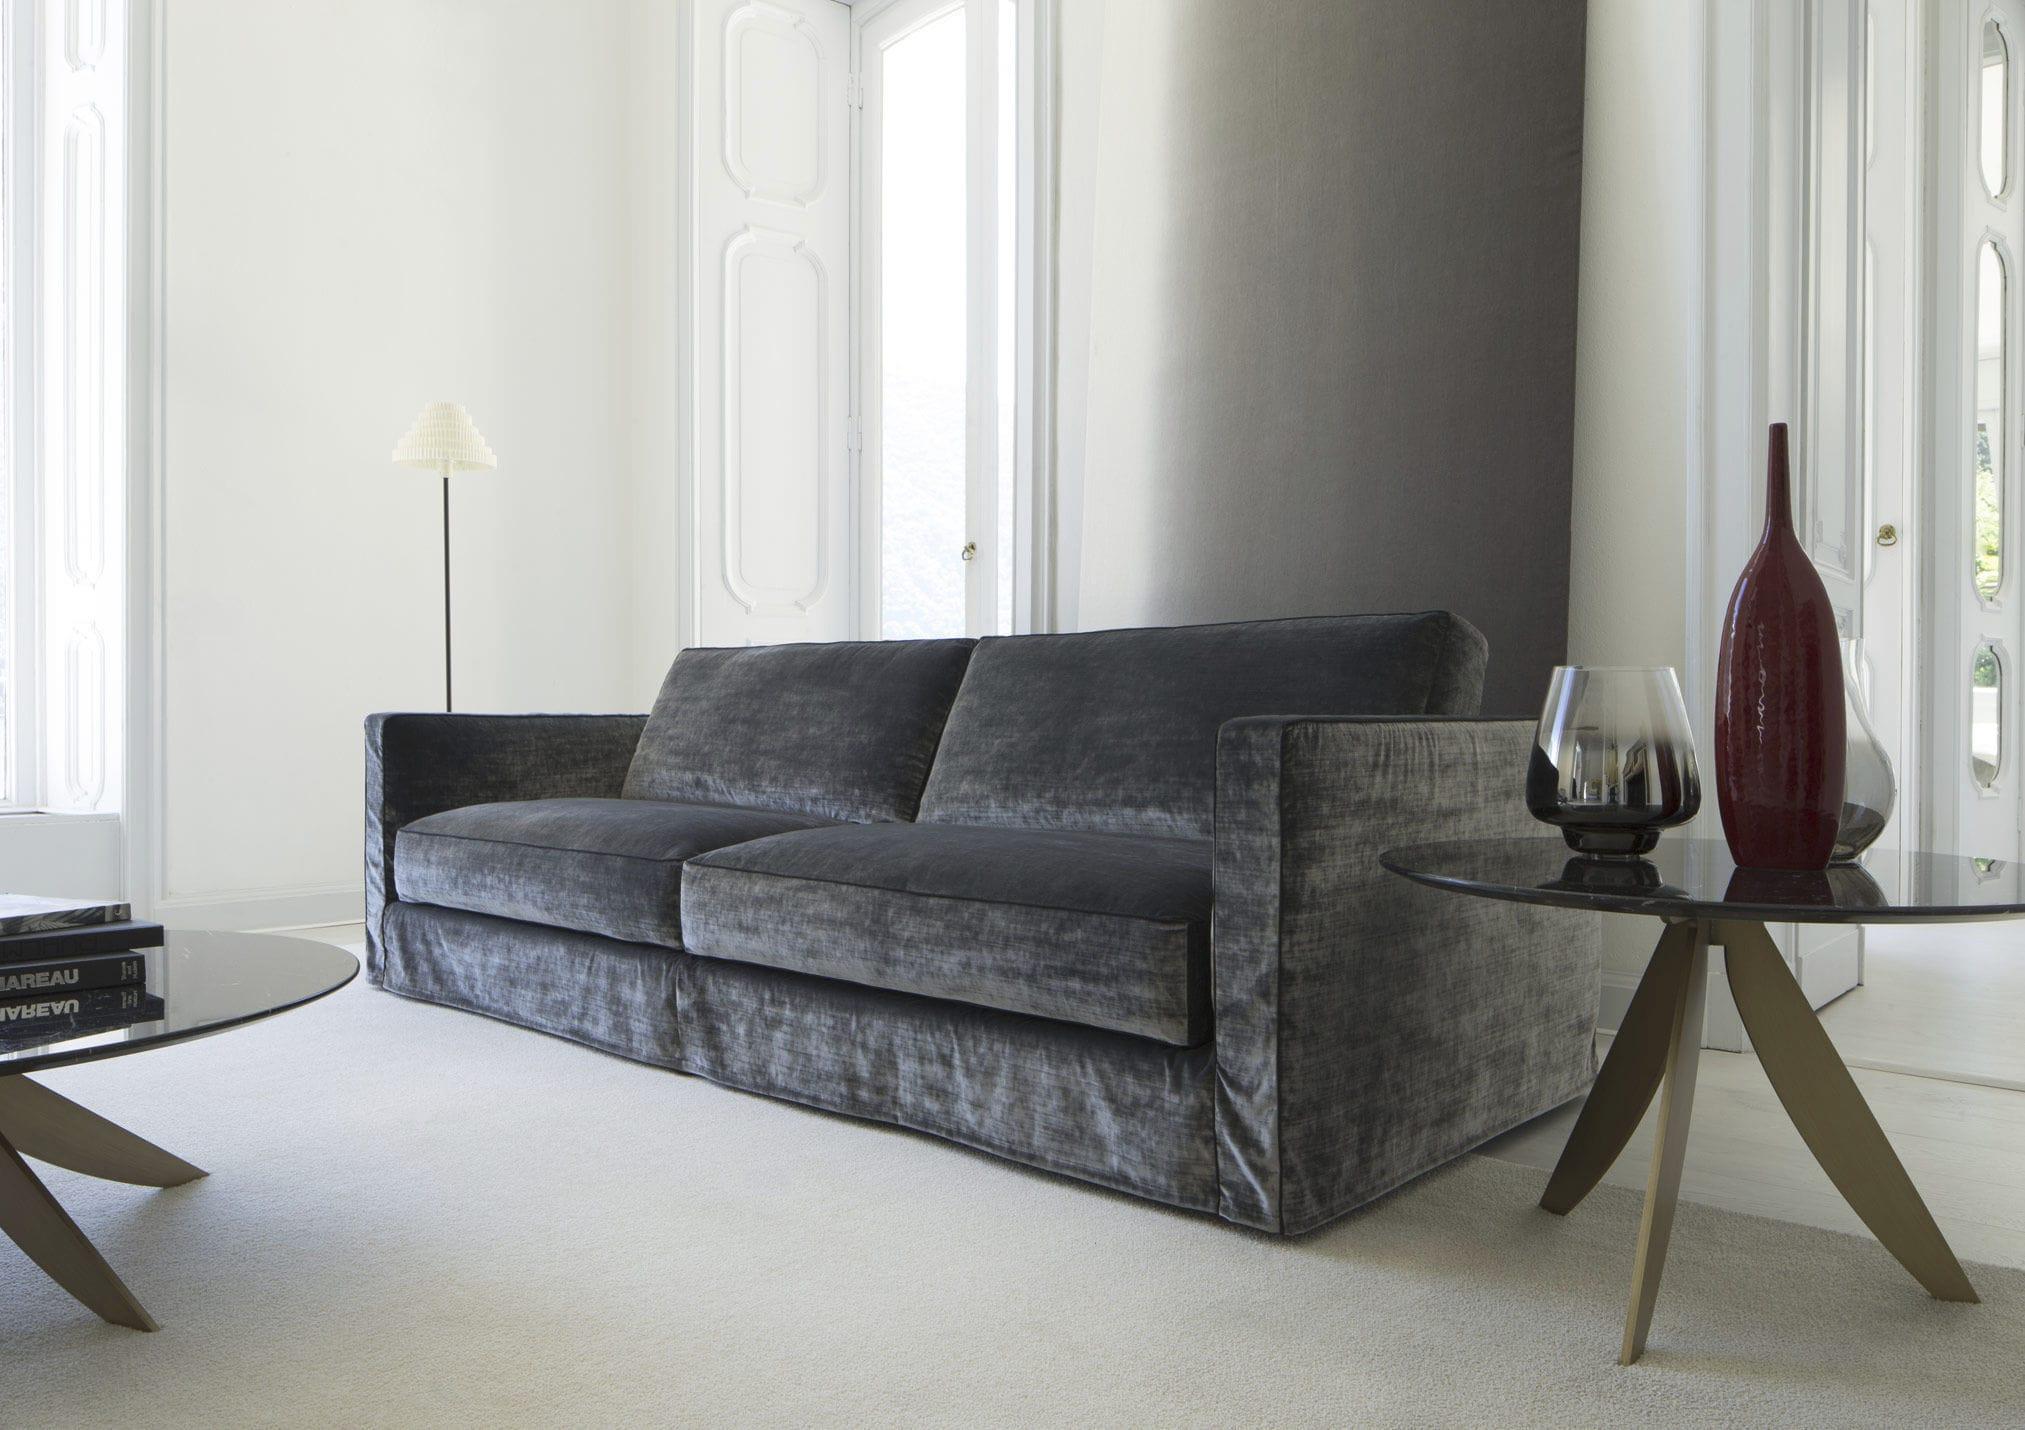 Samt sofa  Modernes Sofa / Samt / Leinen / 4 Plätze - DANTON - BERTO SALOTTI